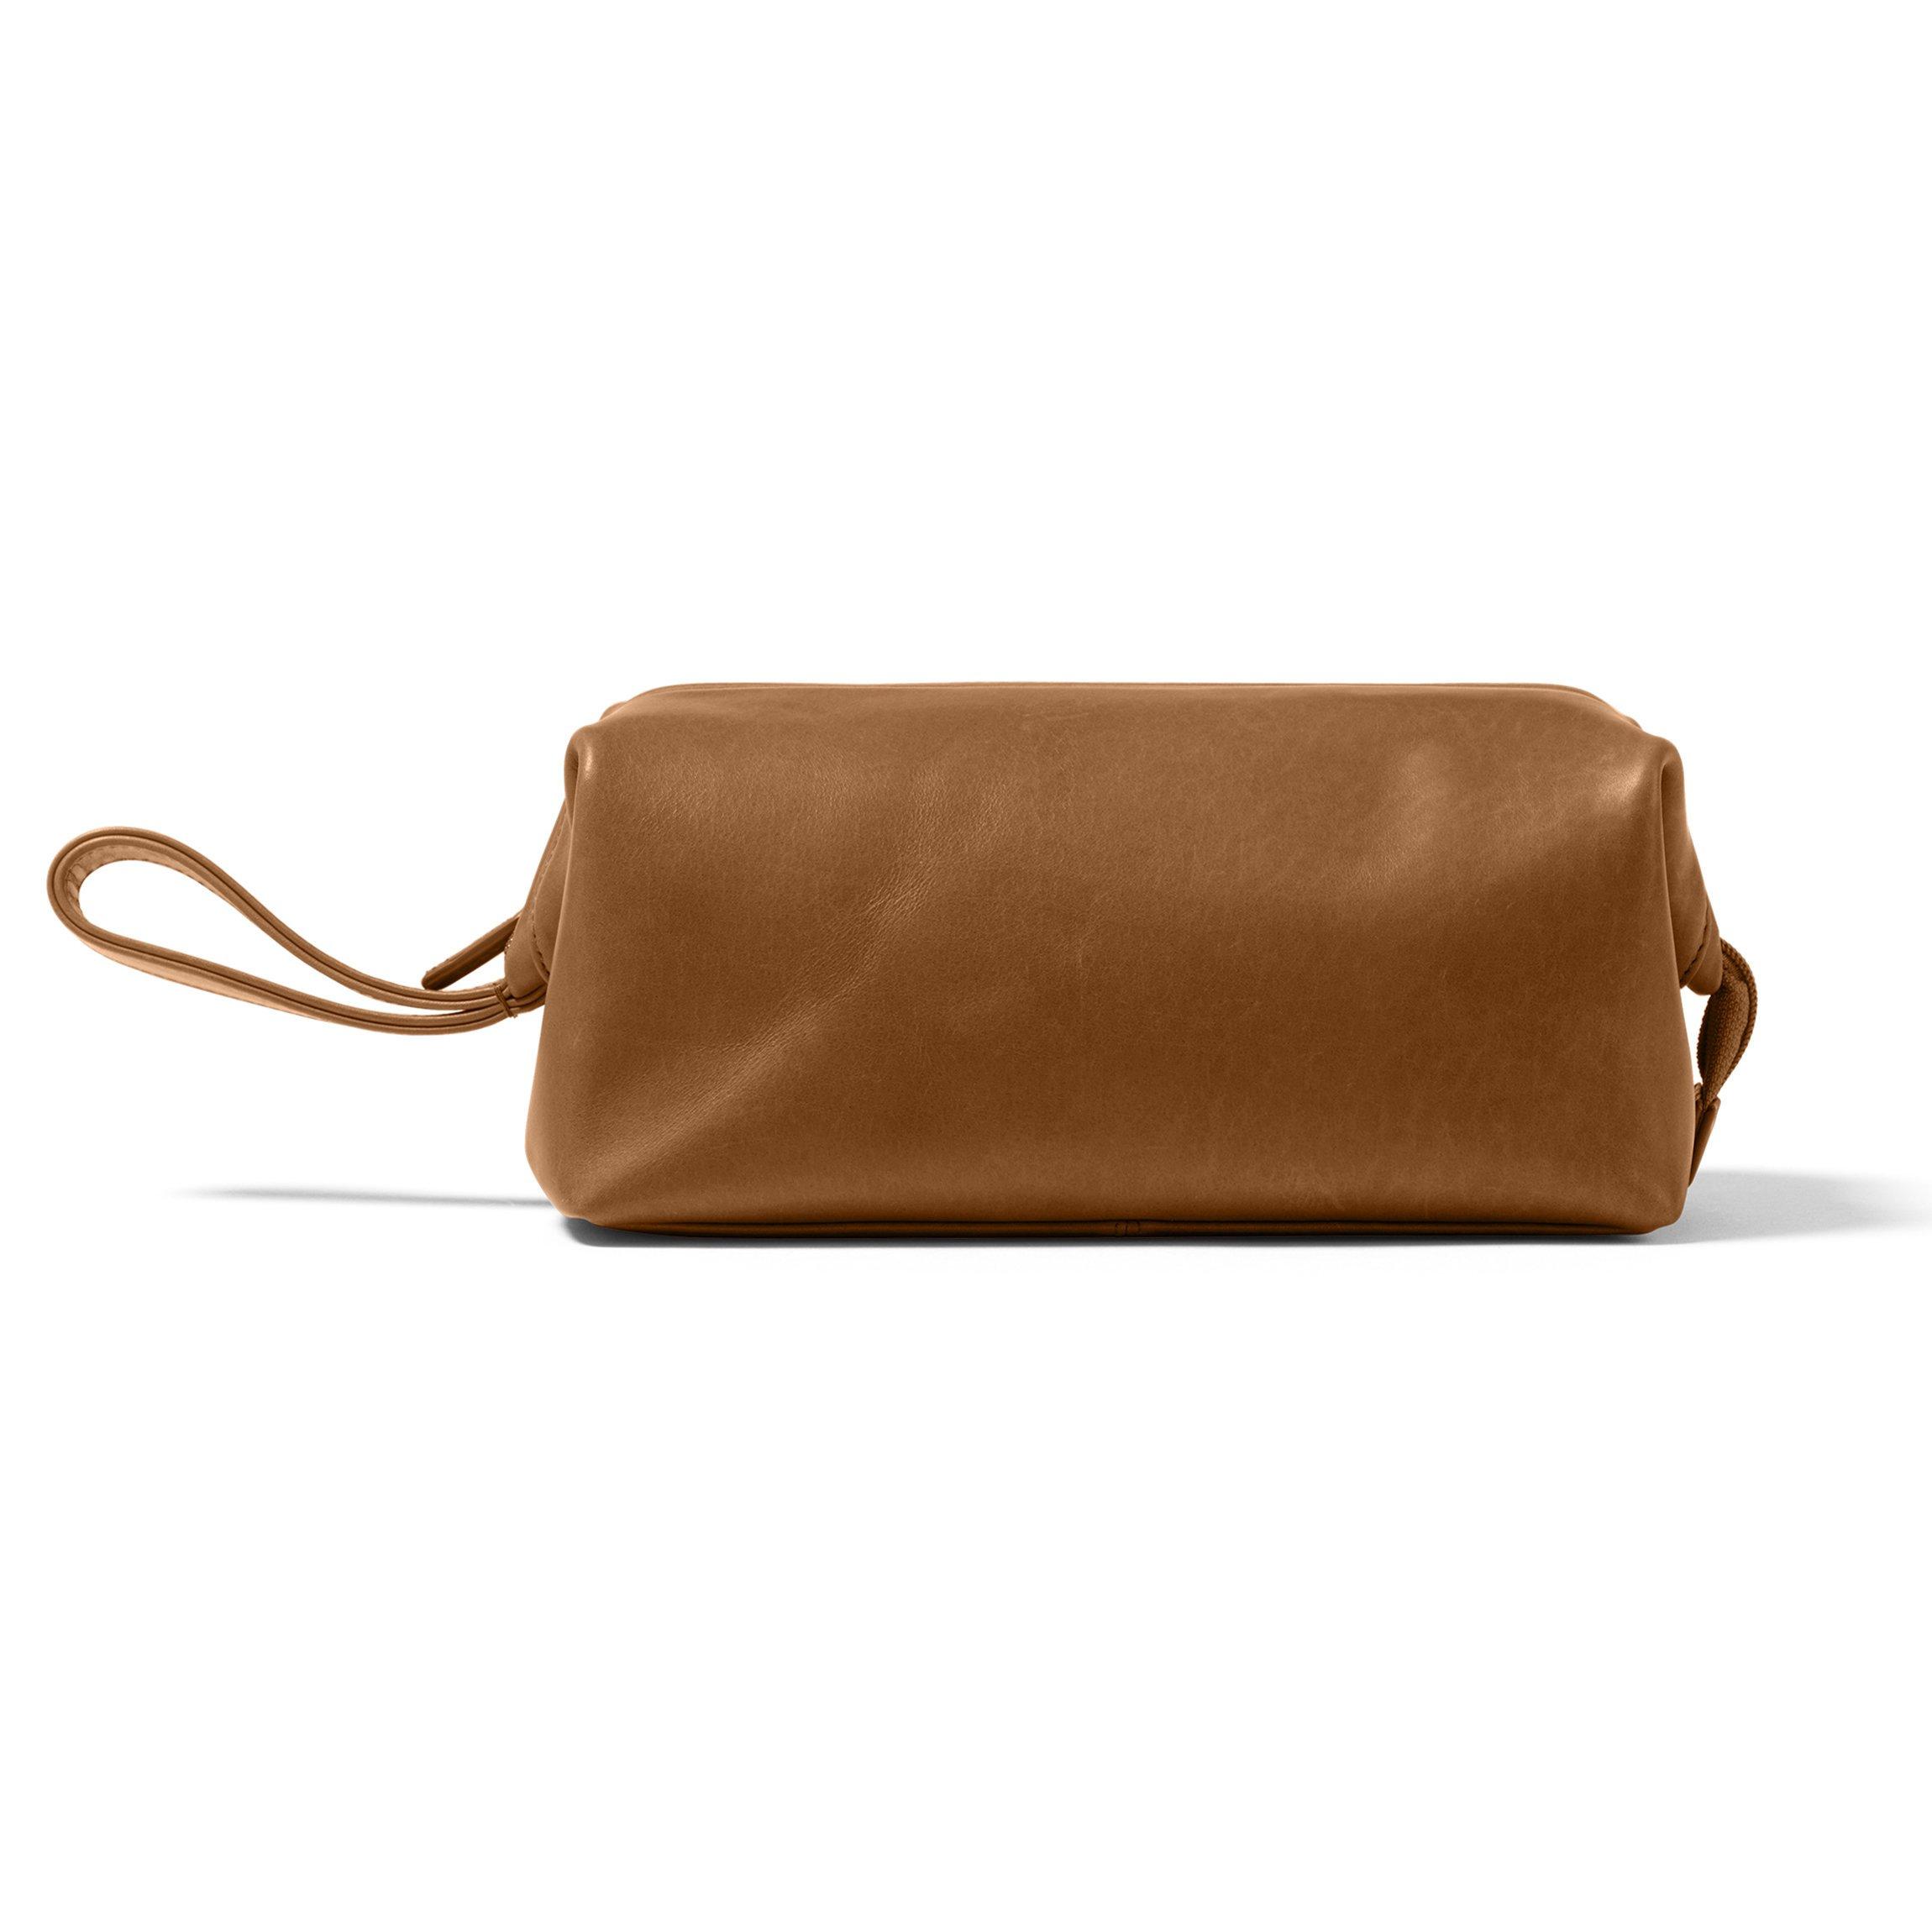 Leatherology Framed Toiletry Bag - Full Grain German Leather Leather - Dark Caramel (brown)